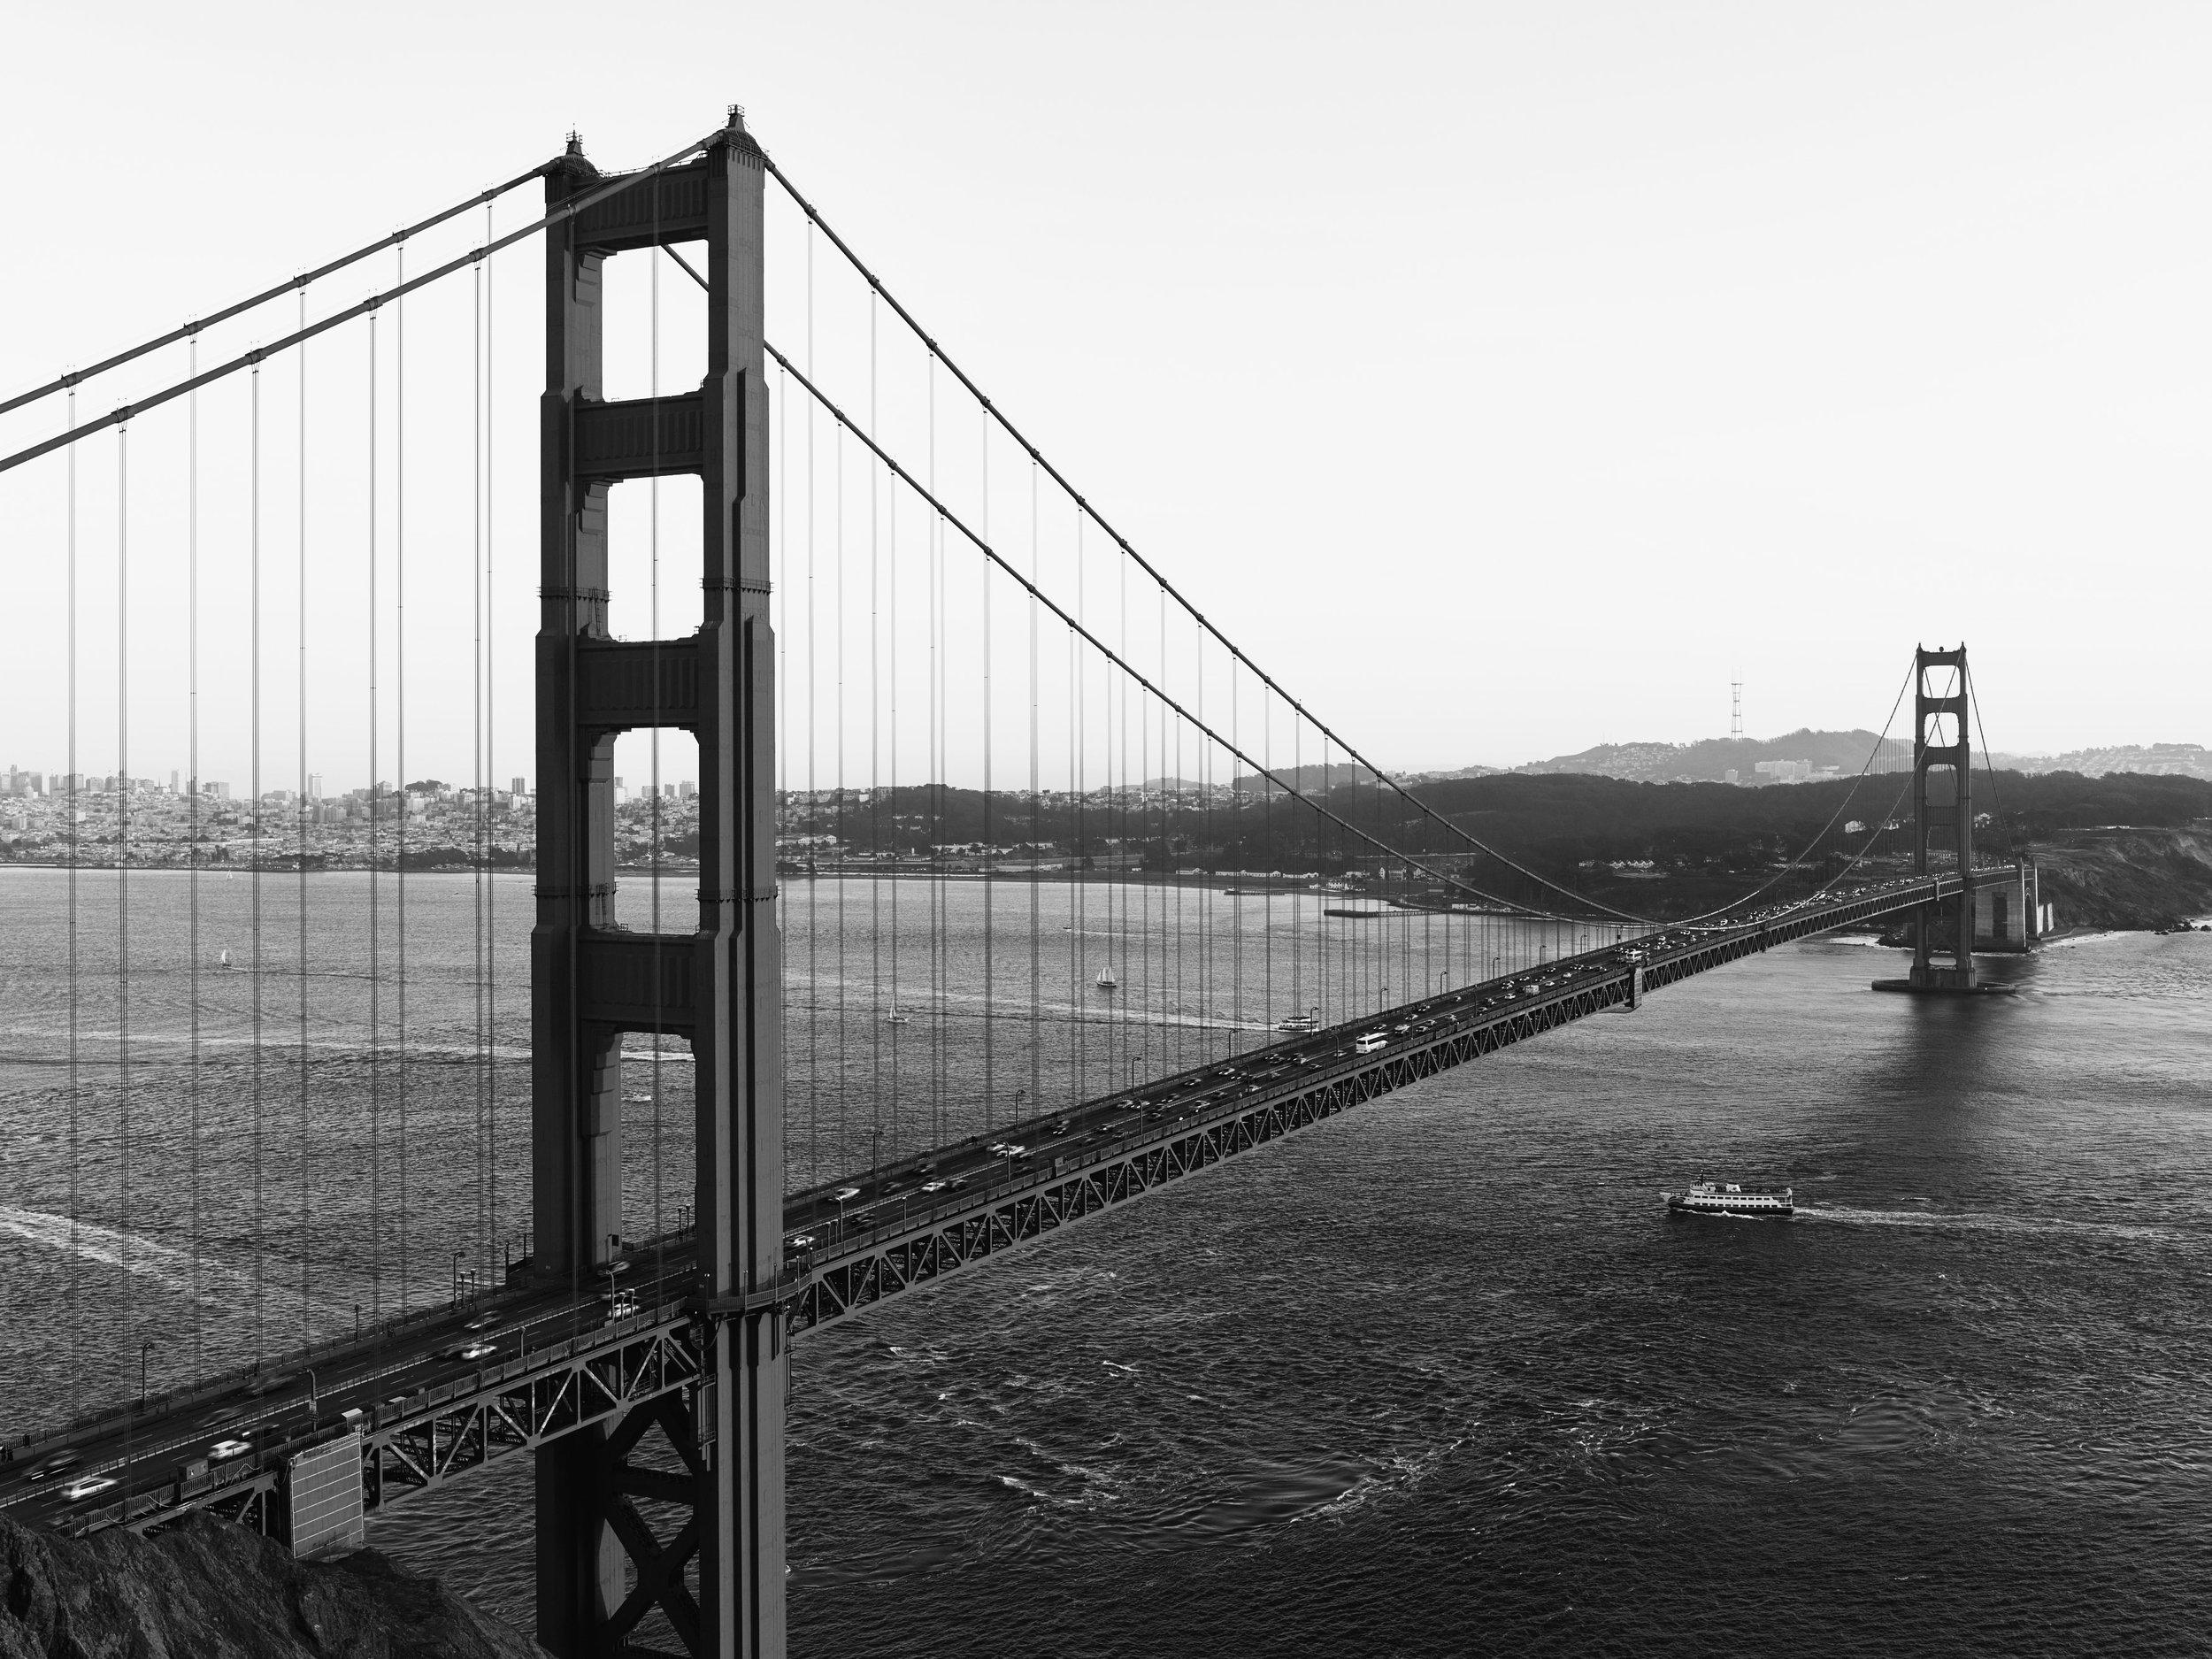 SF_GoldenGateBridge_Panorama1 005172_bw.jpg